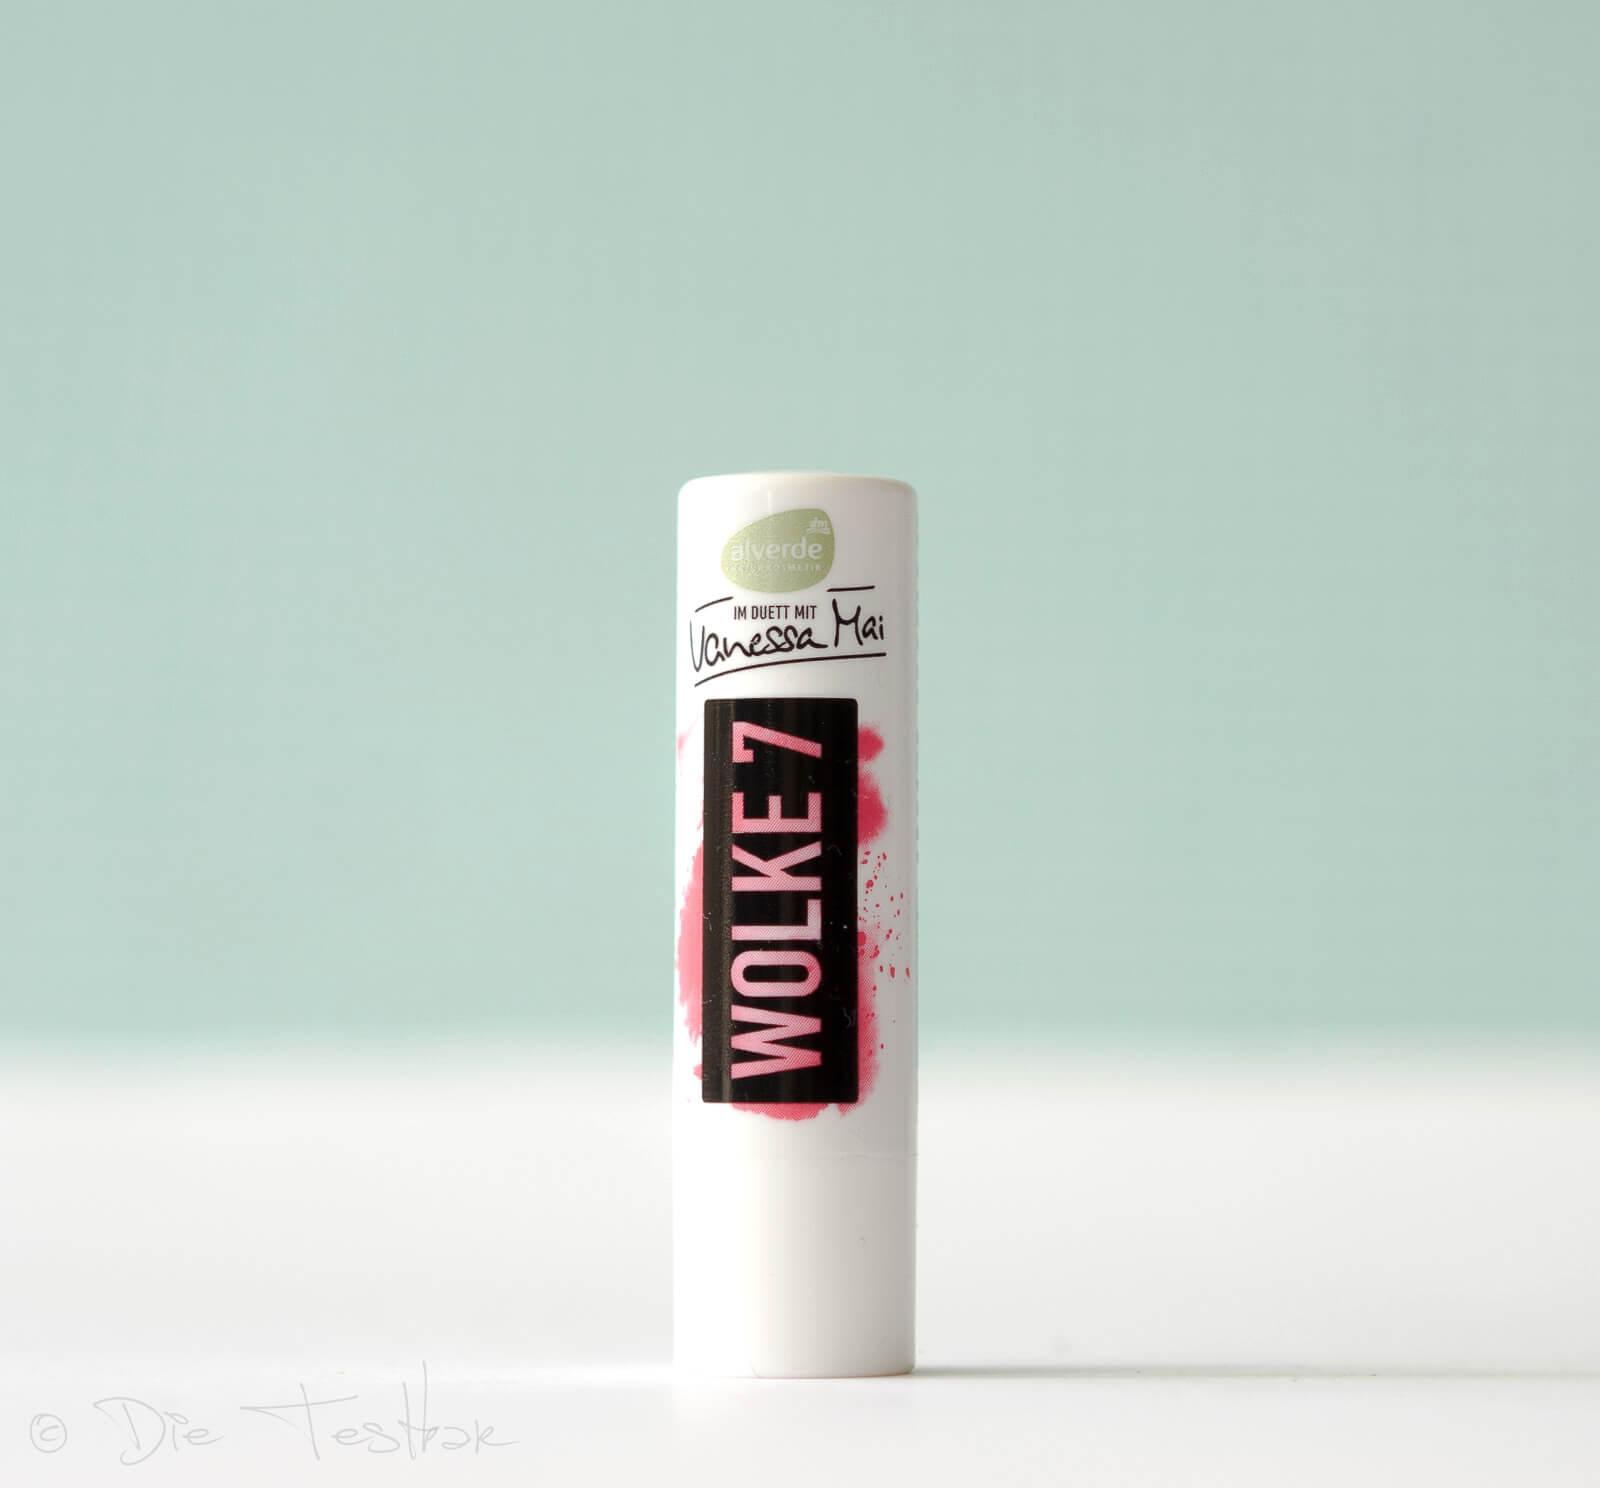 alverde NATURKOSMETIK -Vanessa Mai Wolke 7 Lippenpflege Lip Balm